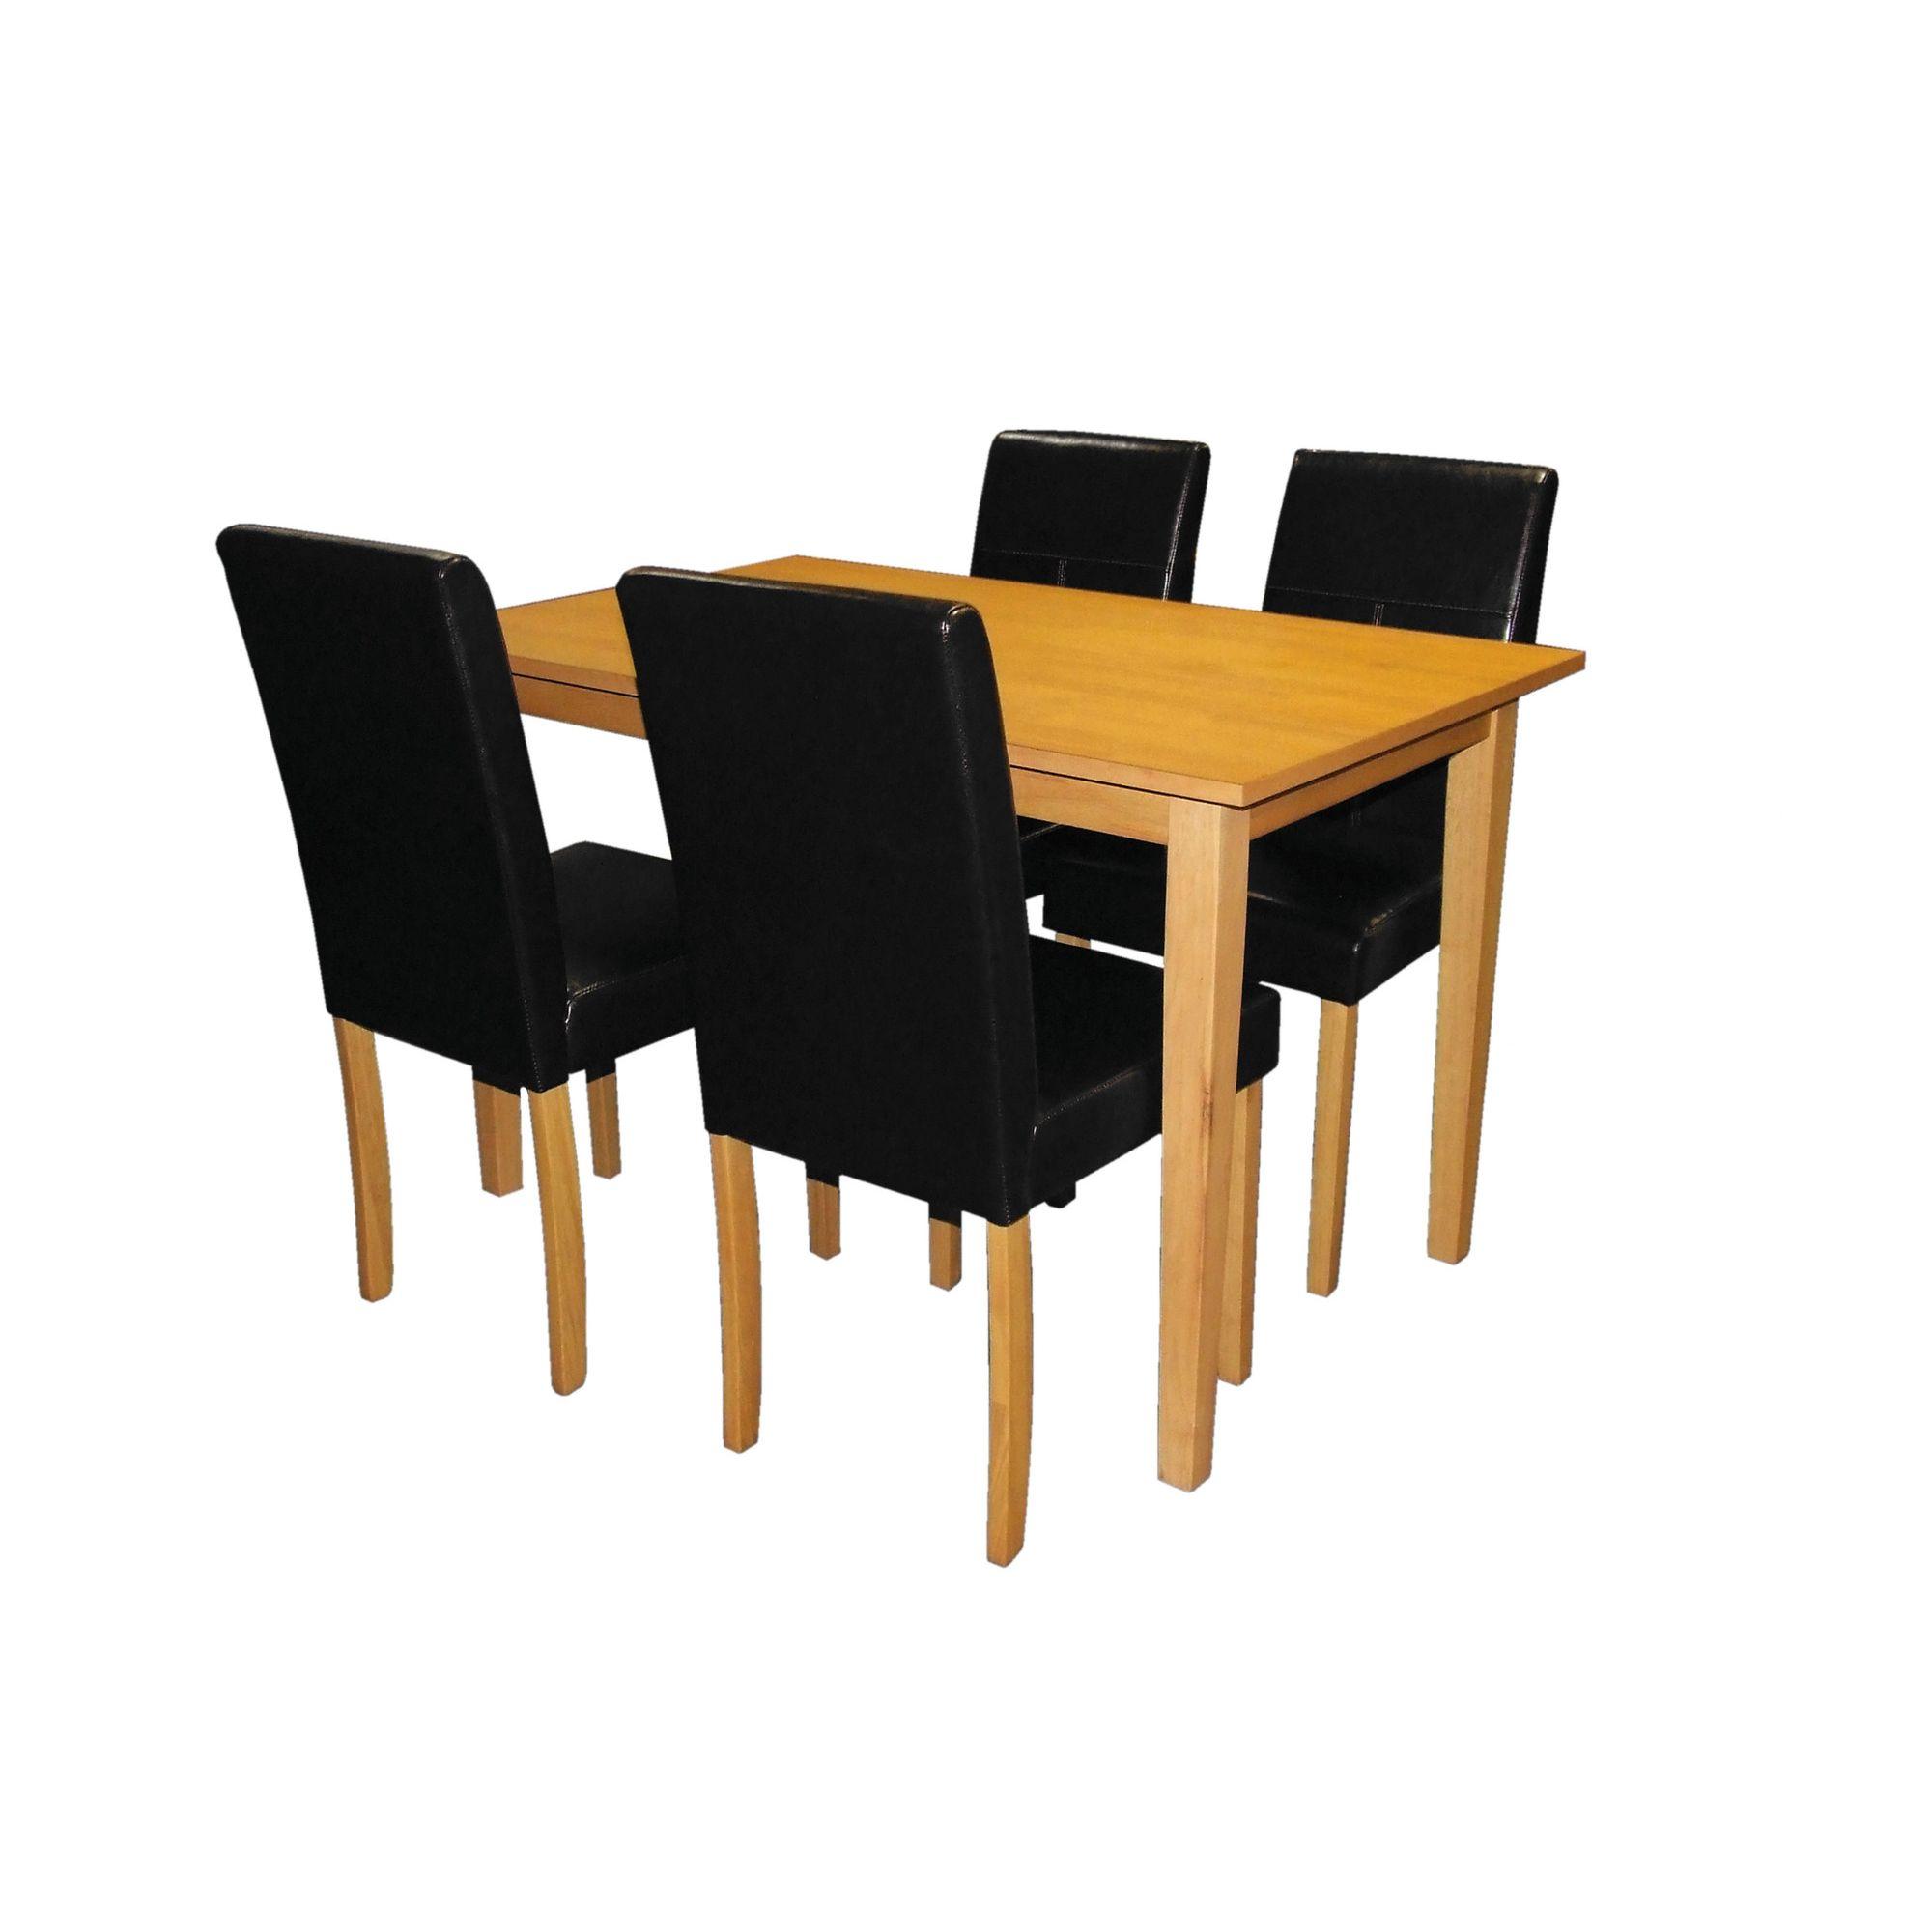 Premier Housewares 5 Piece Dining Set with Light Solid Rubberwood Cozinha - Black at Tesco Direct